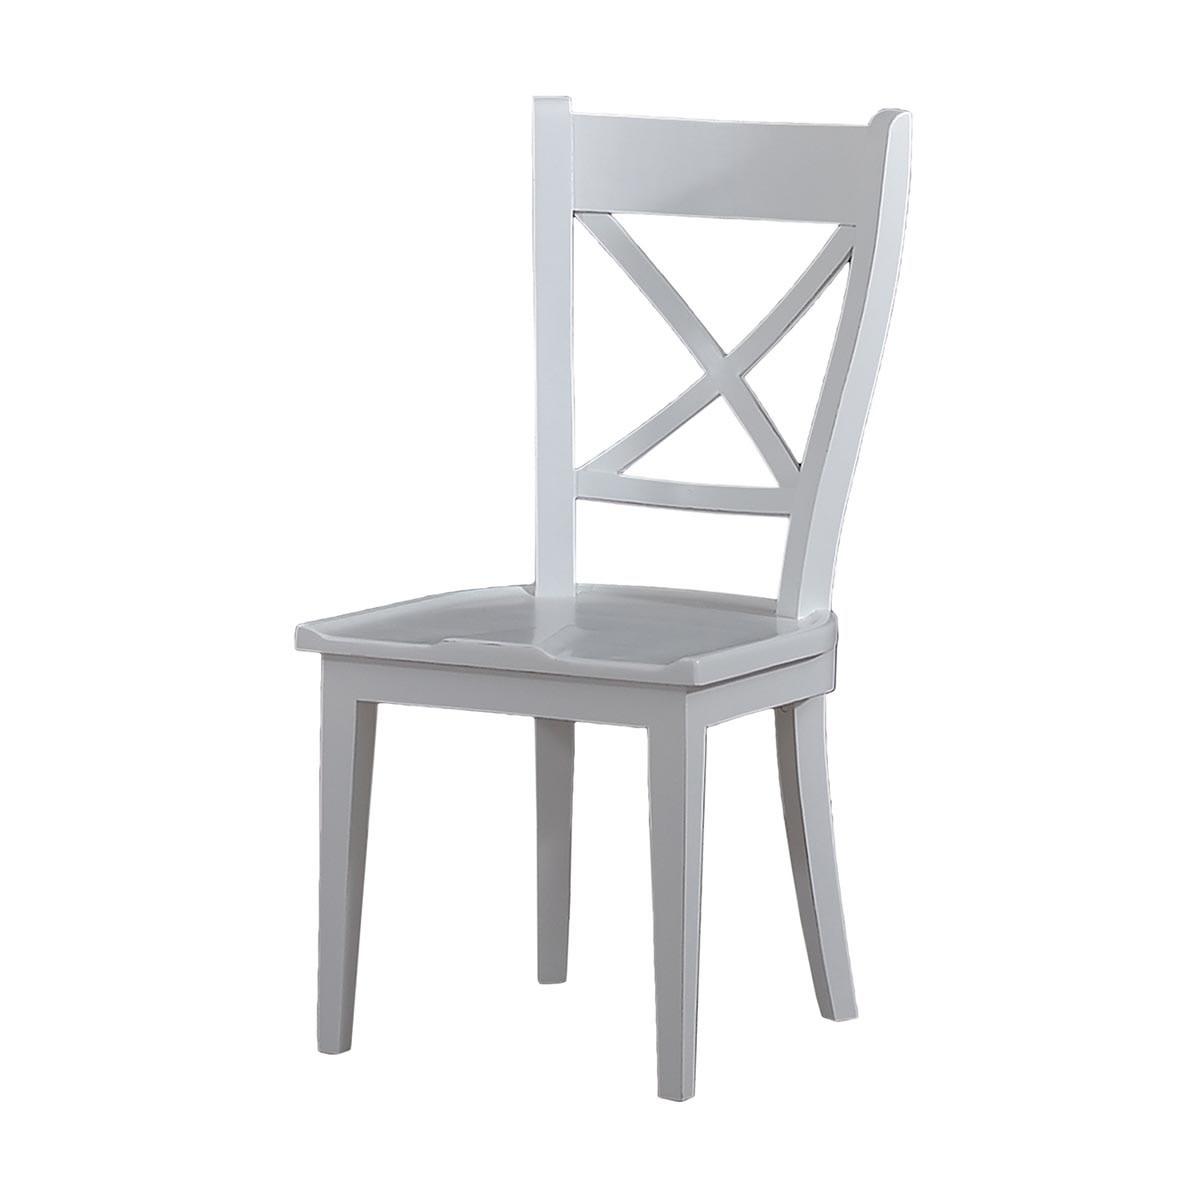 Summerset Chair WGY